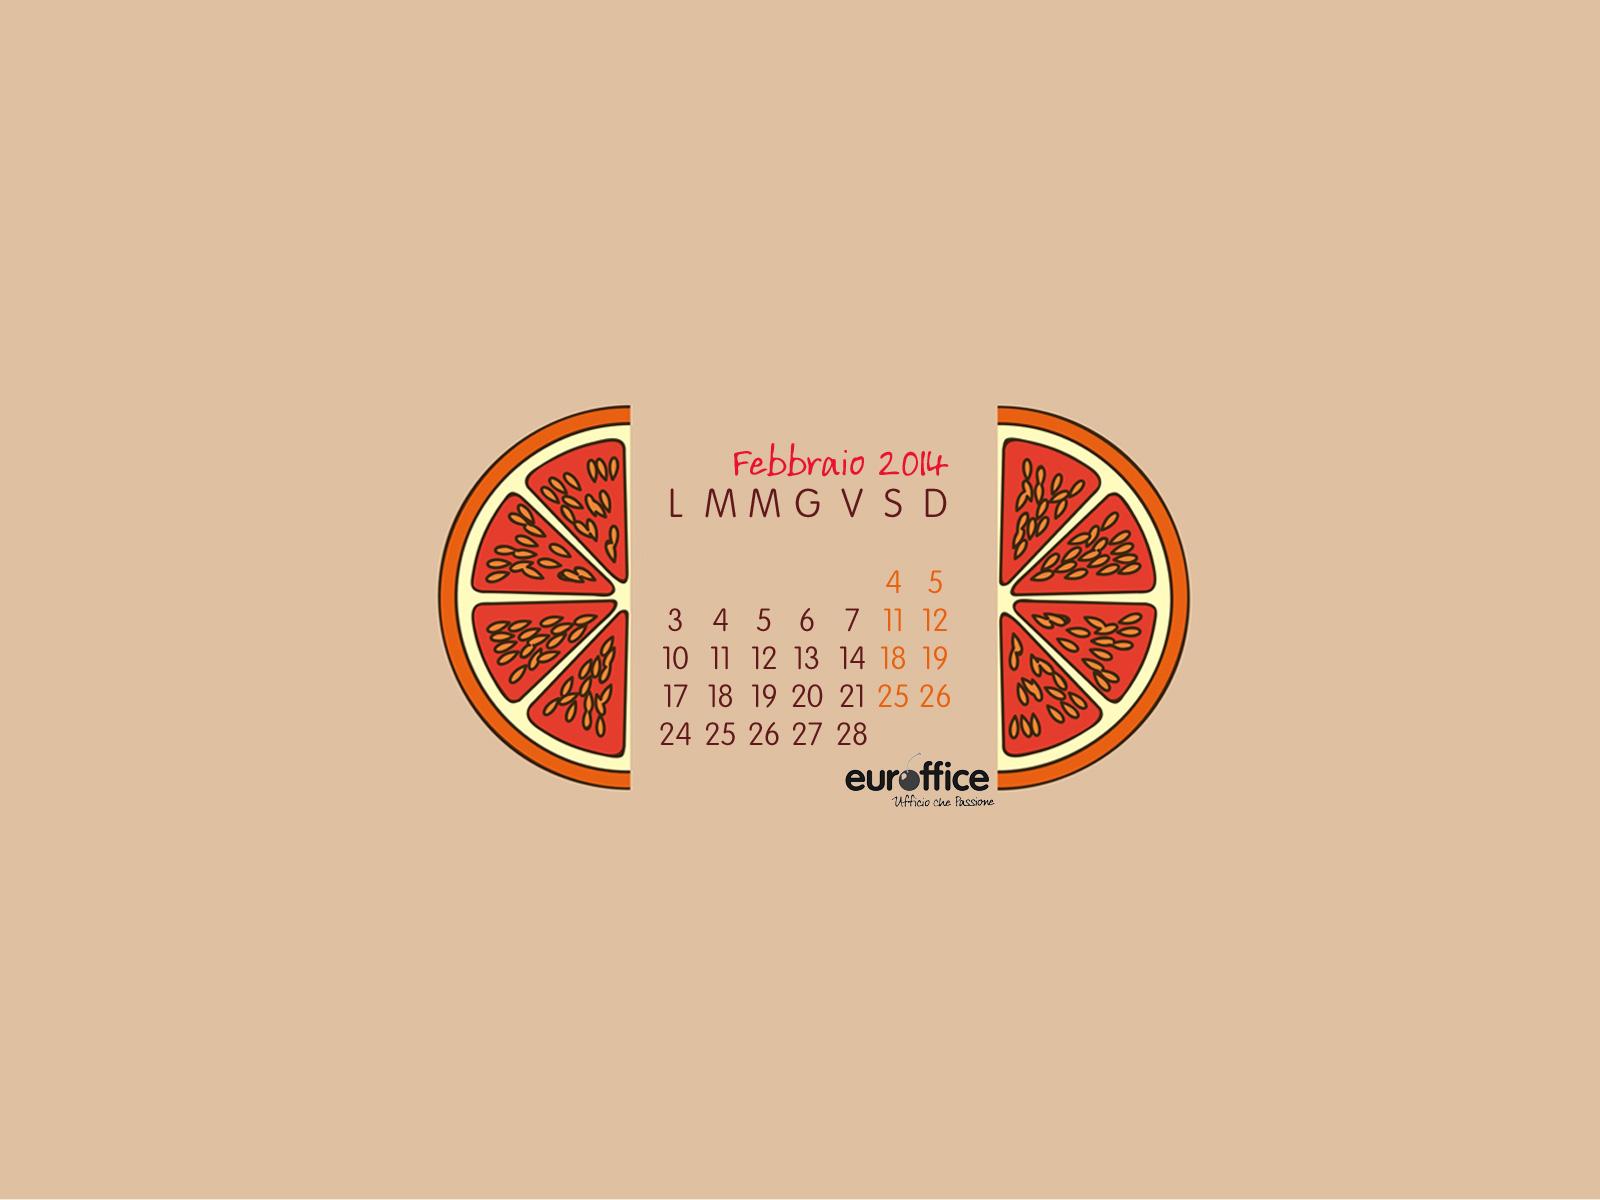 Wallpaper febbraio 2014 - Vitamina C